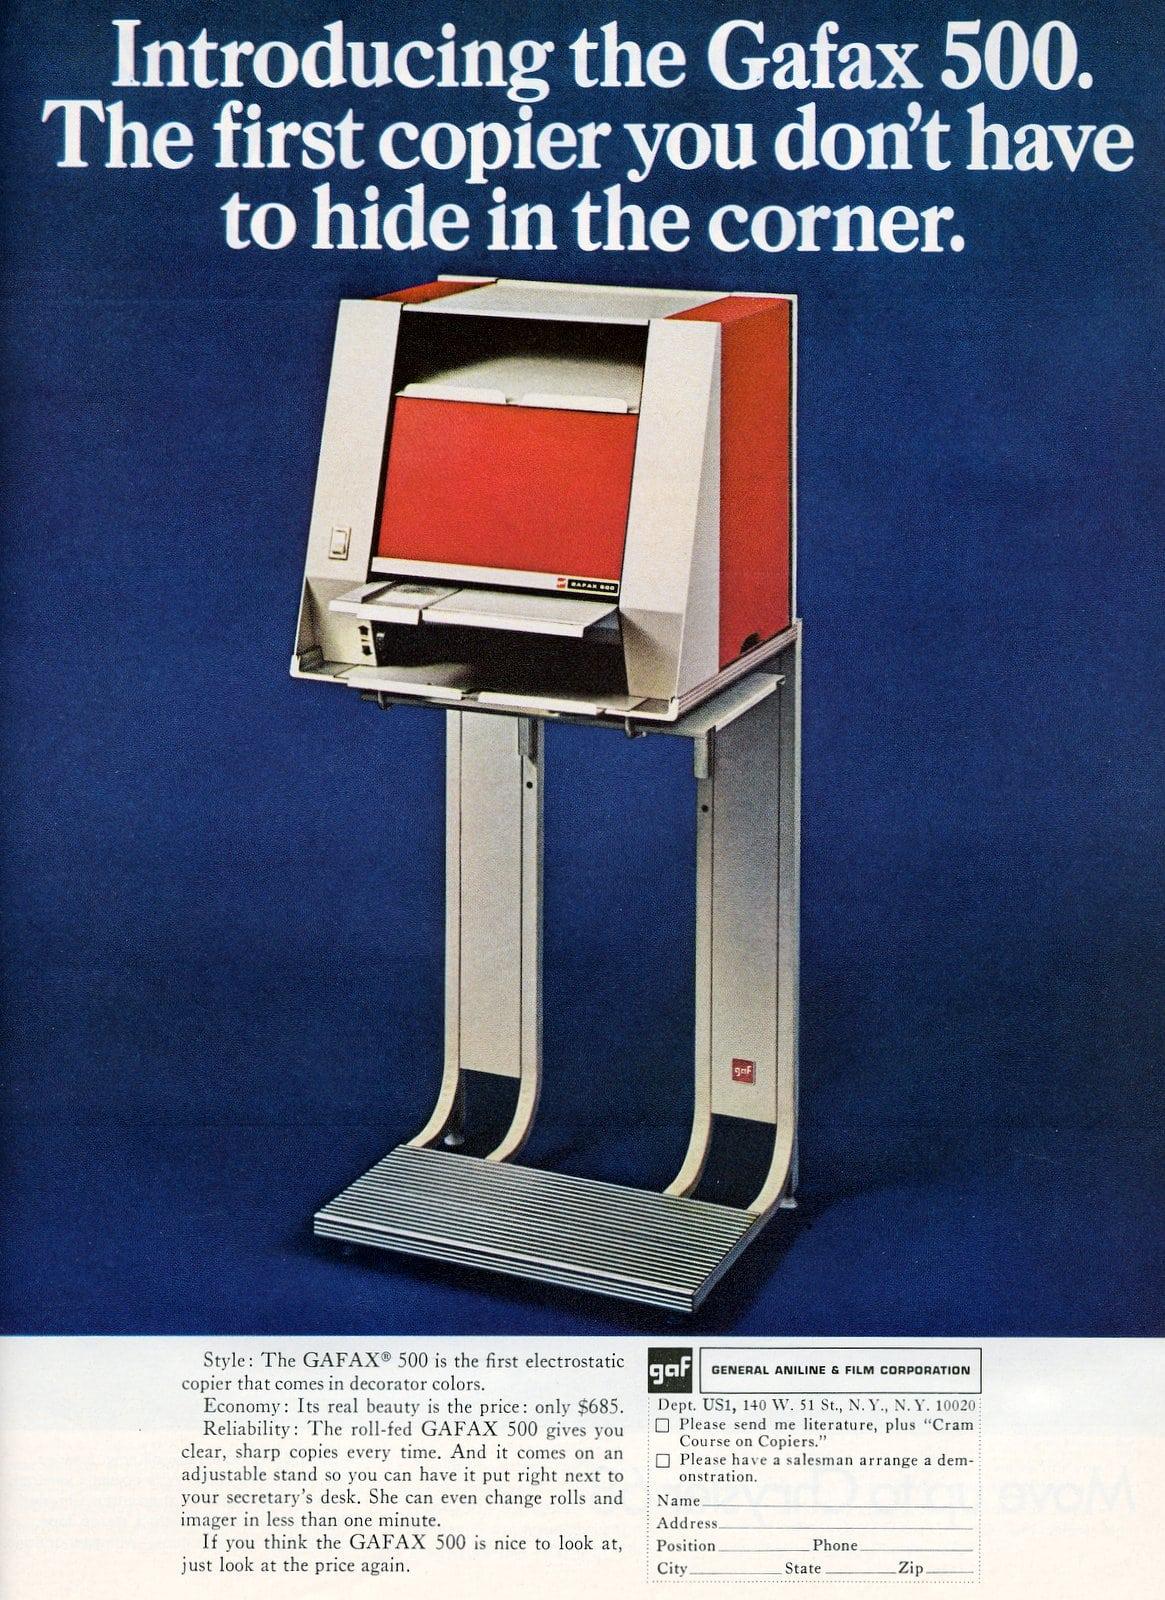 Vintage Gafax 500 office copier (1967)